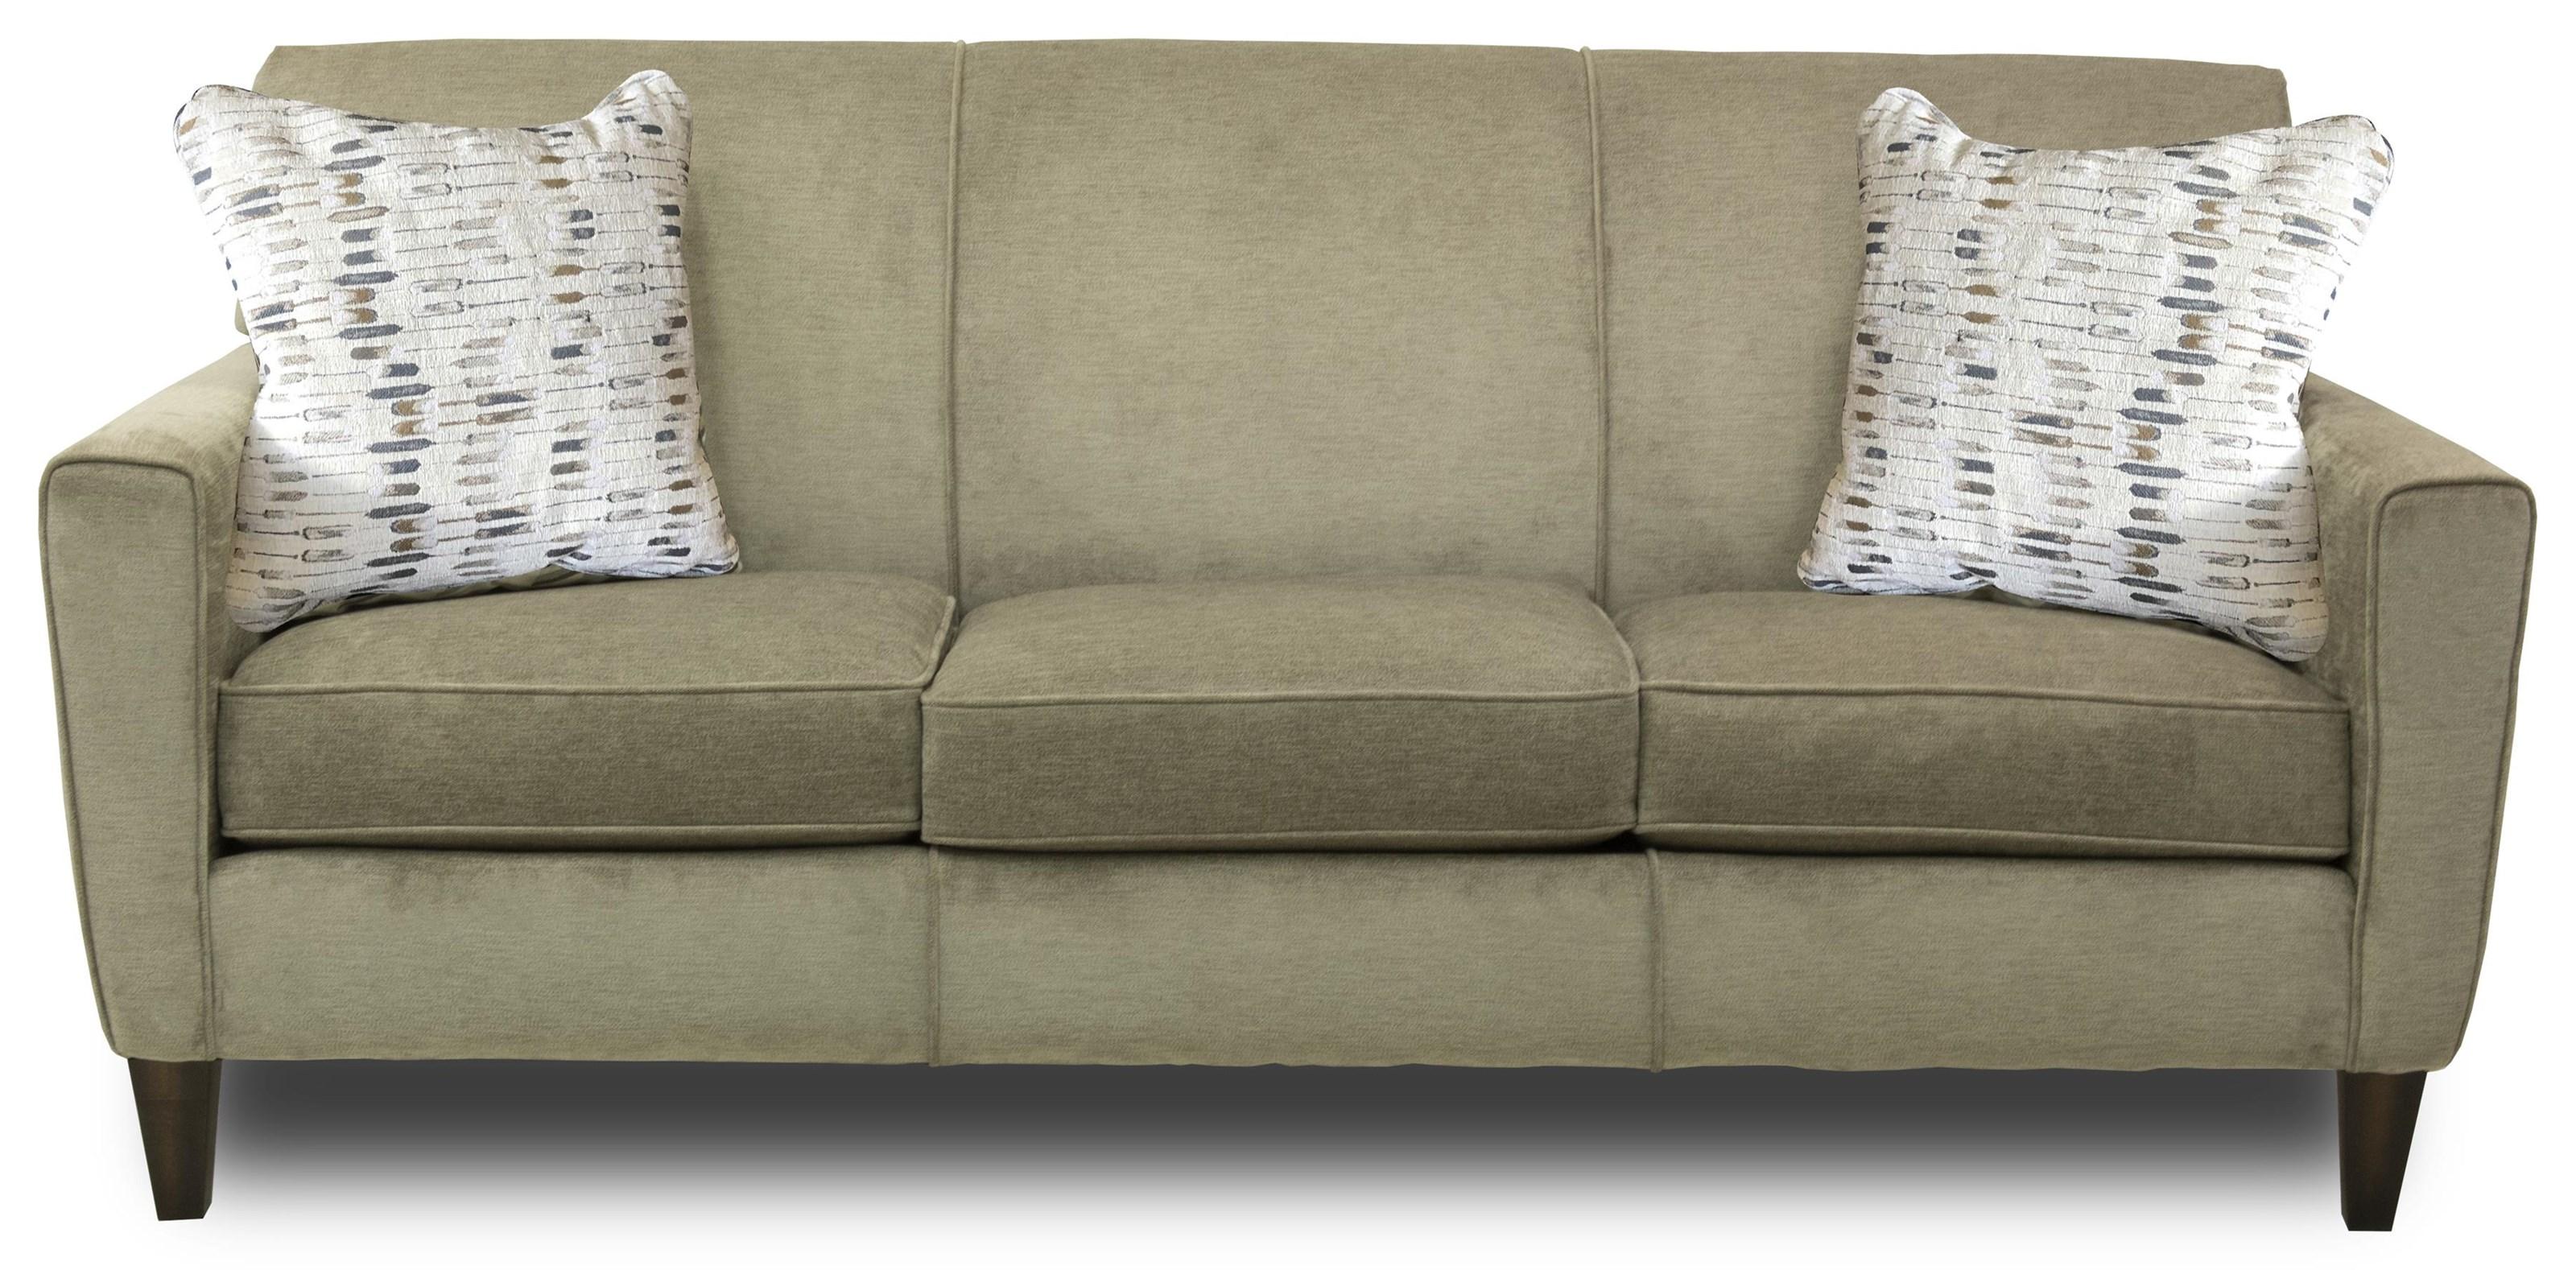 Digby Sofa by Flexsteel at Ruby Gordon Home